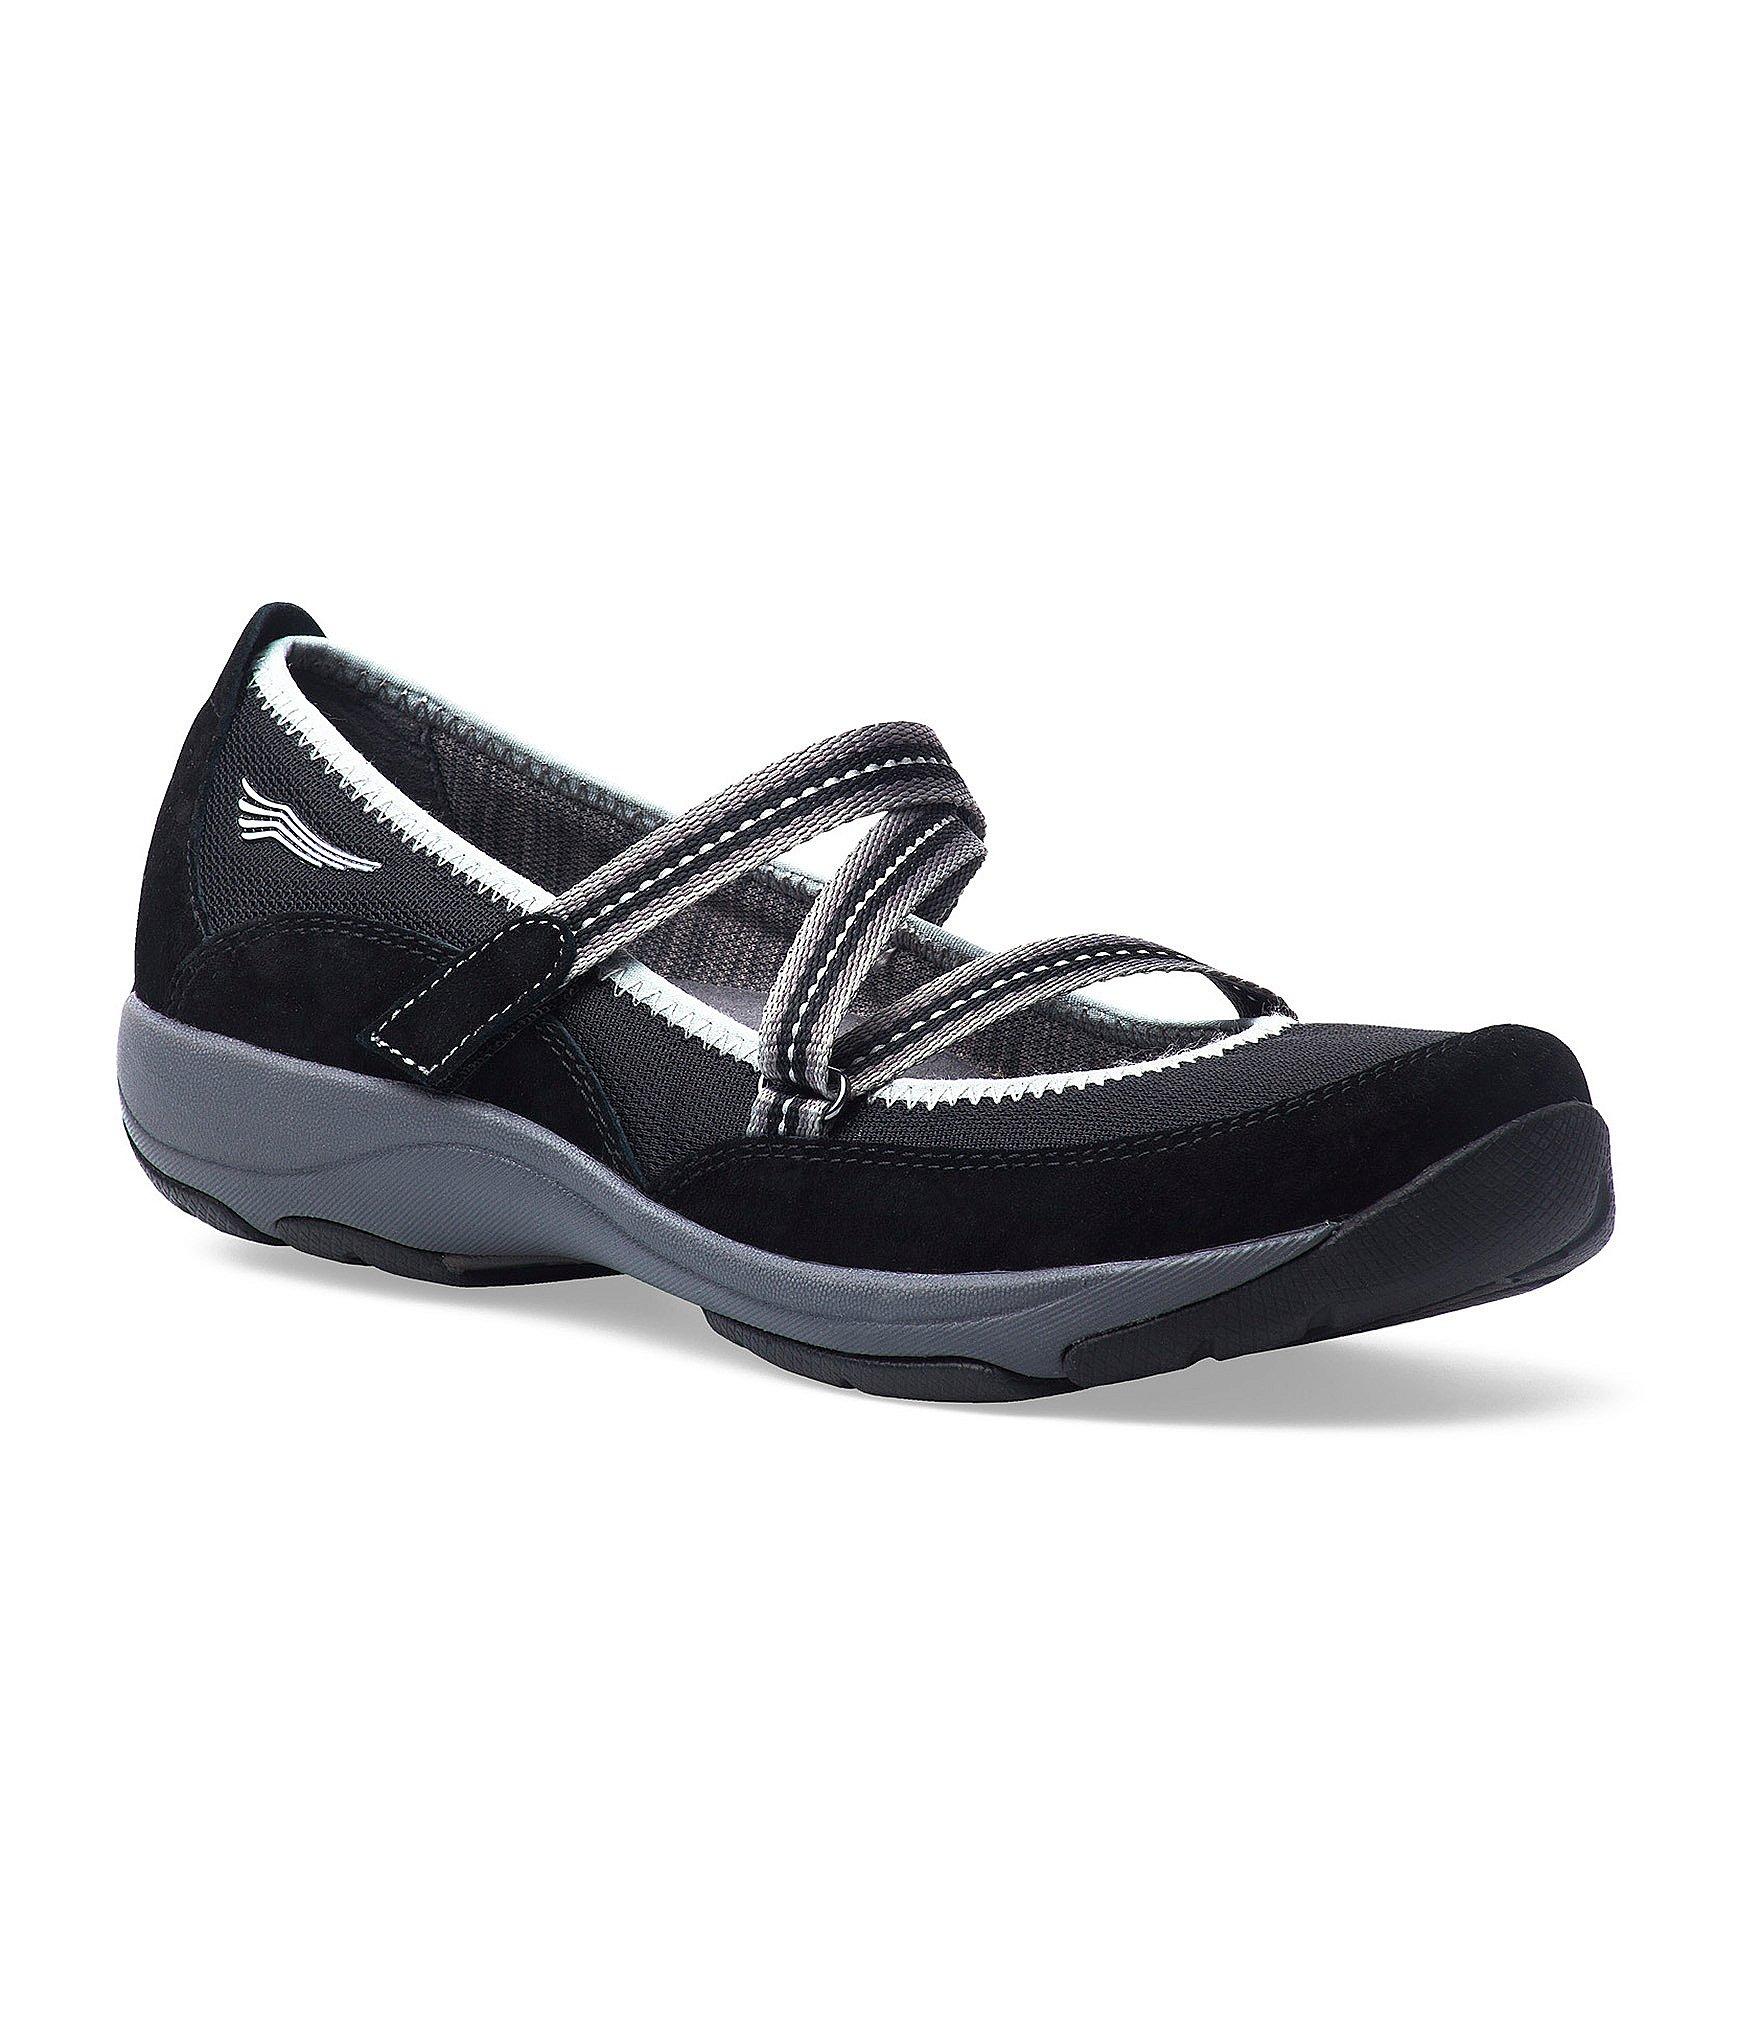 Dansko Mary Jane Shoes Sale